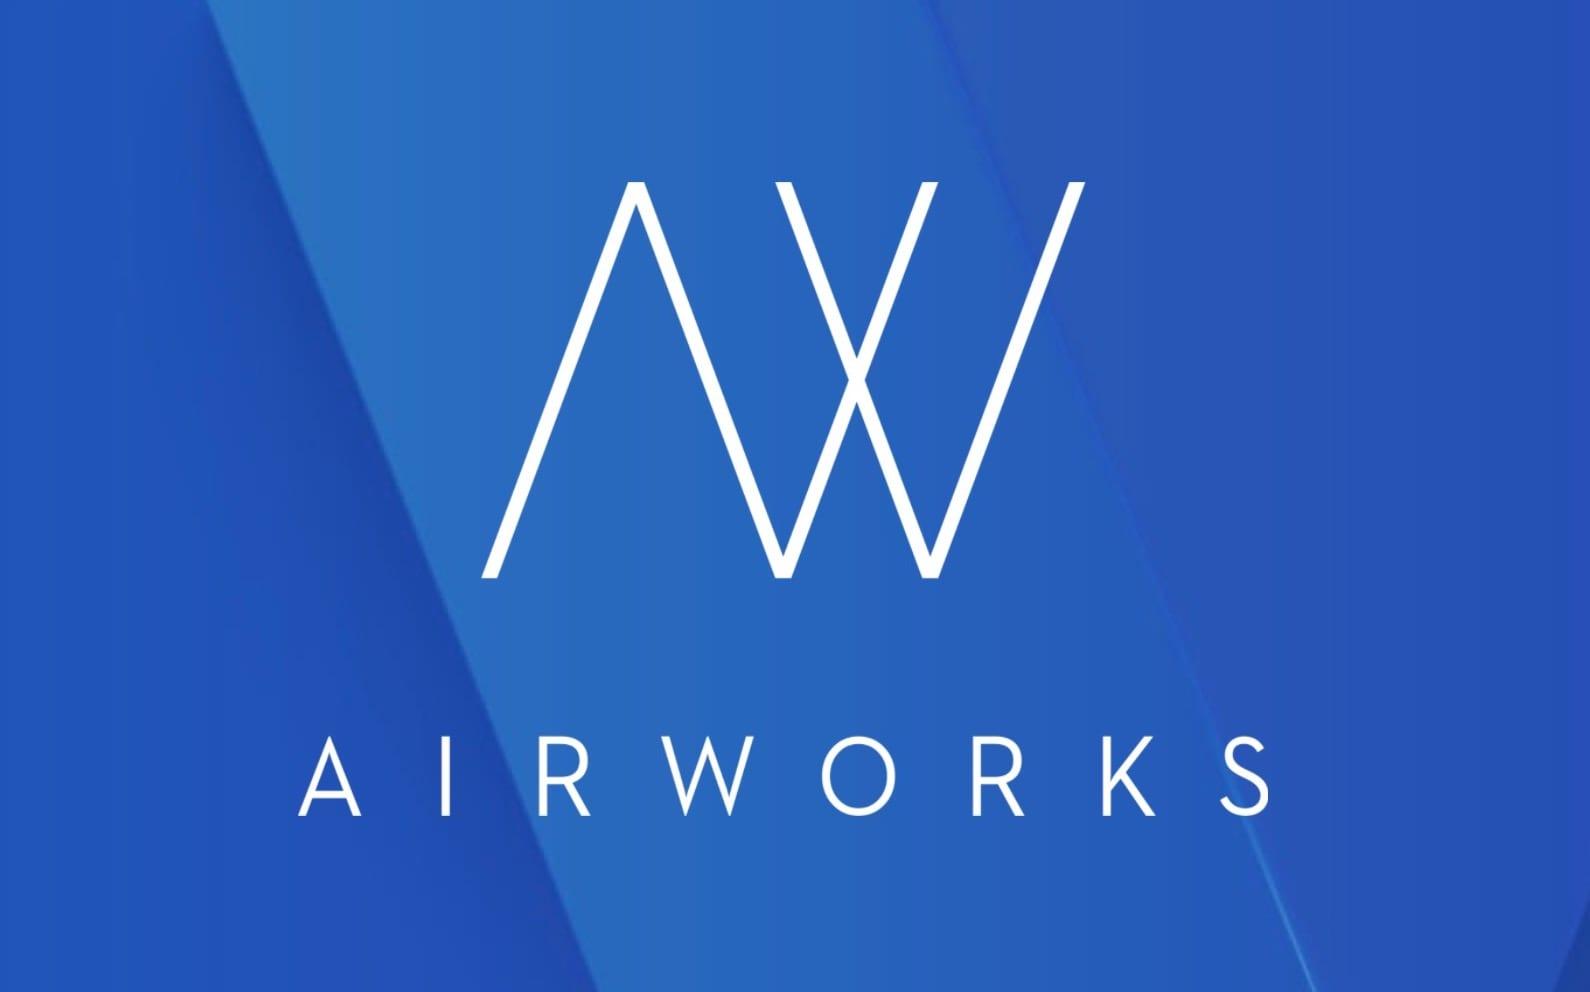 DJI Airworks 2020